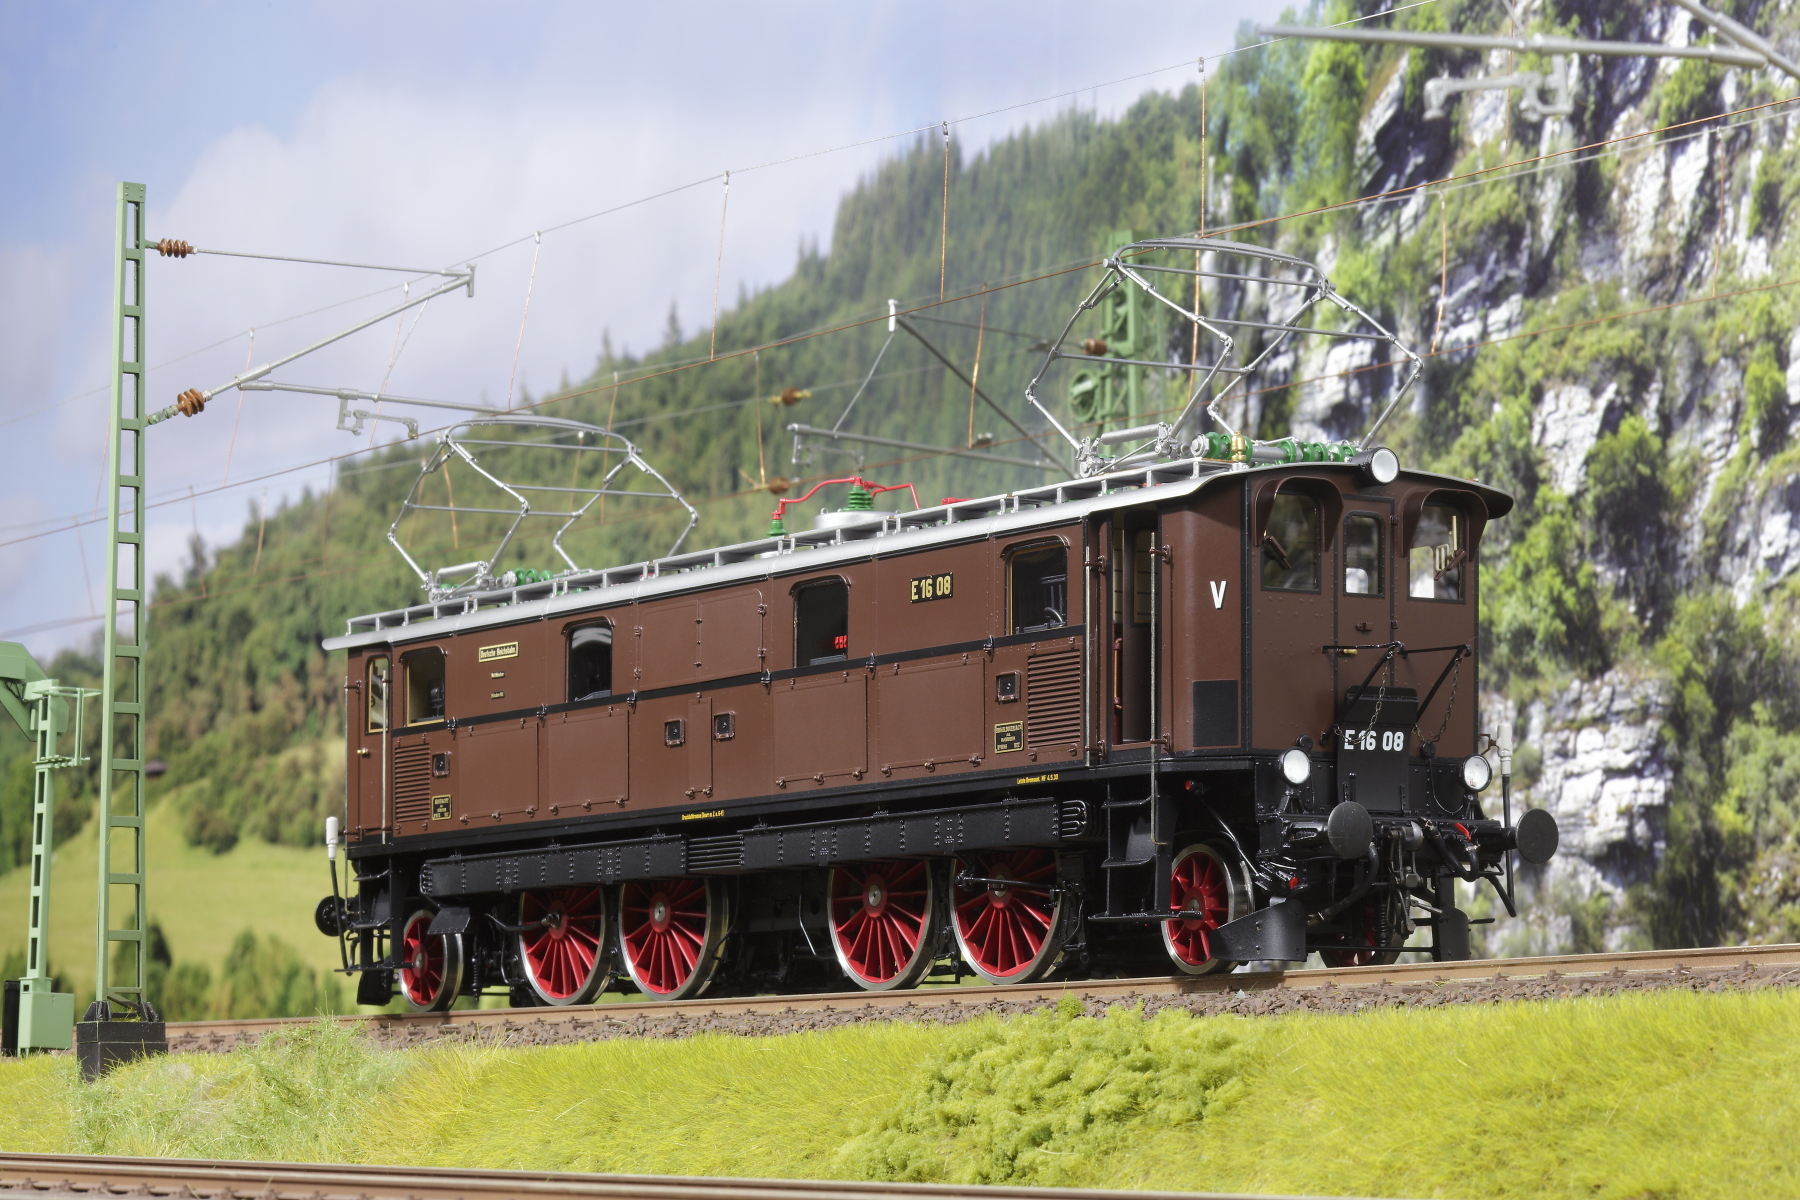 Spur 1 Lokomotive Baureihe E 16 08 Epoche IIb rotbraun